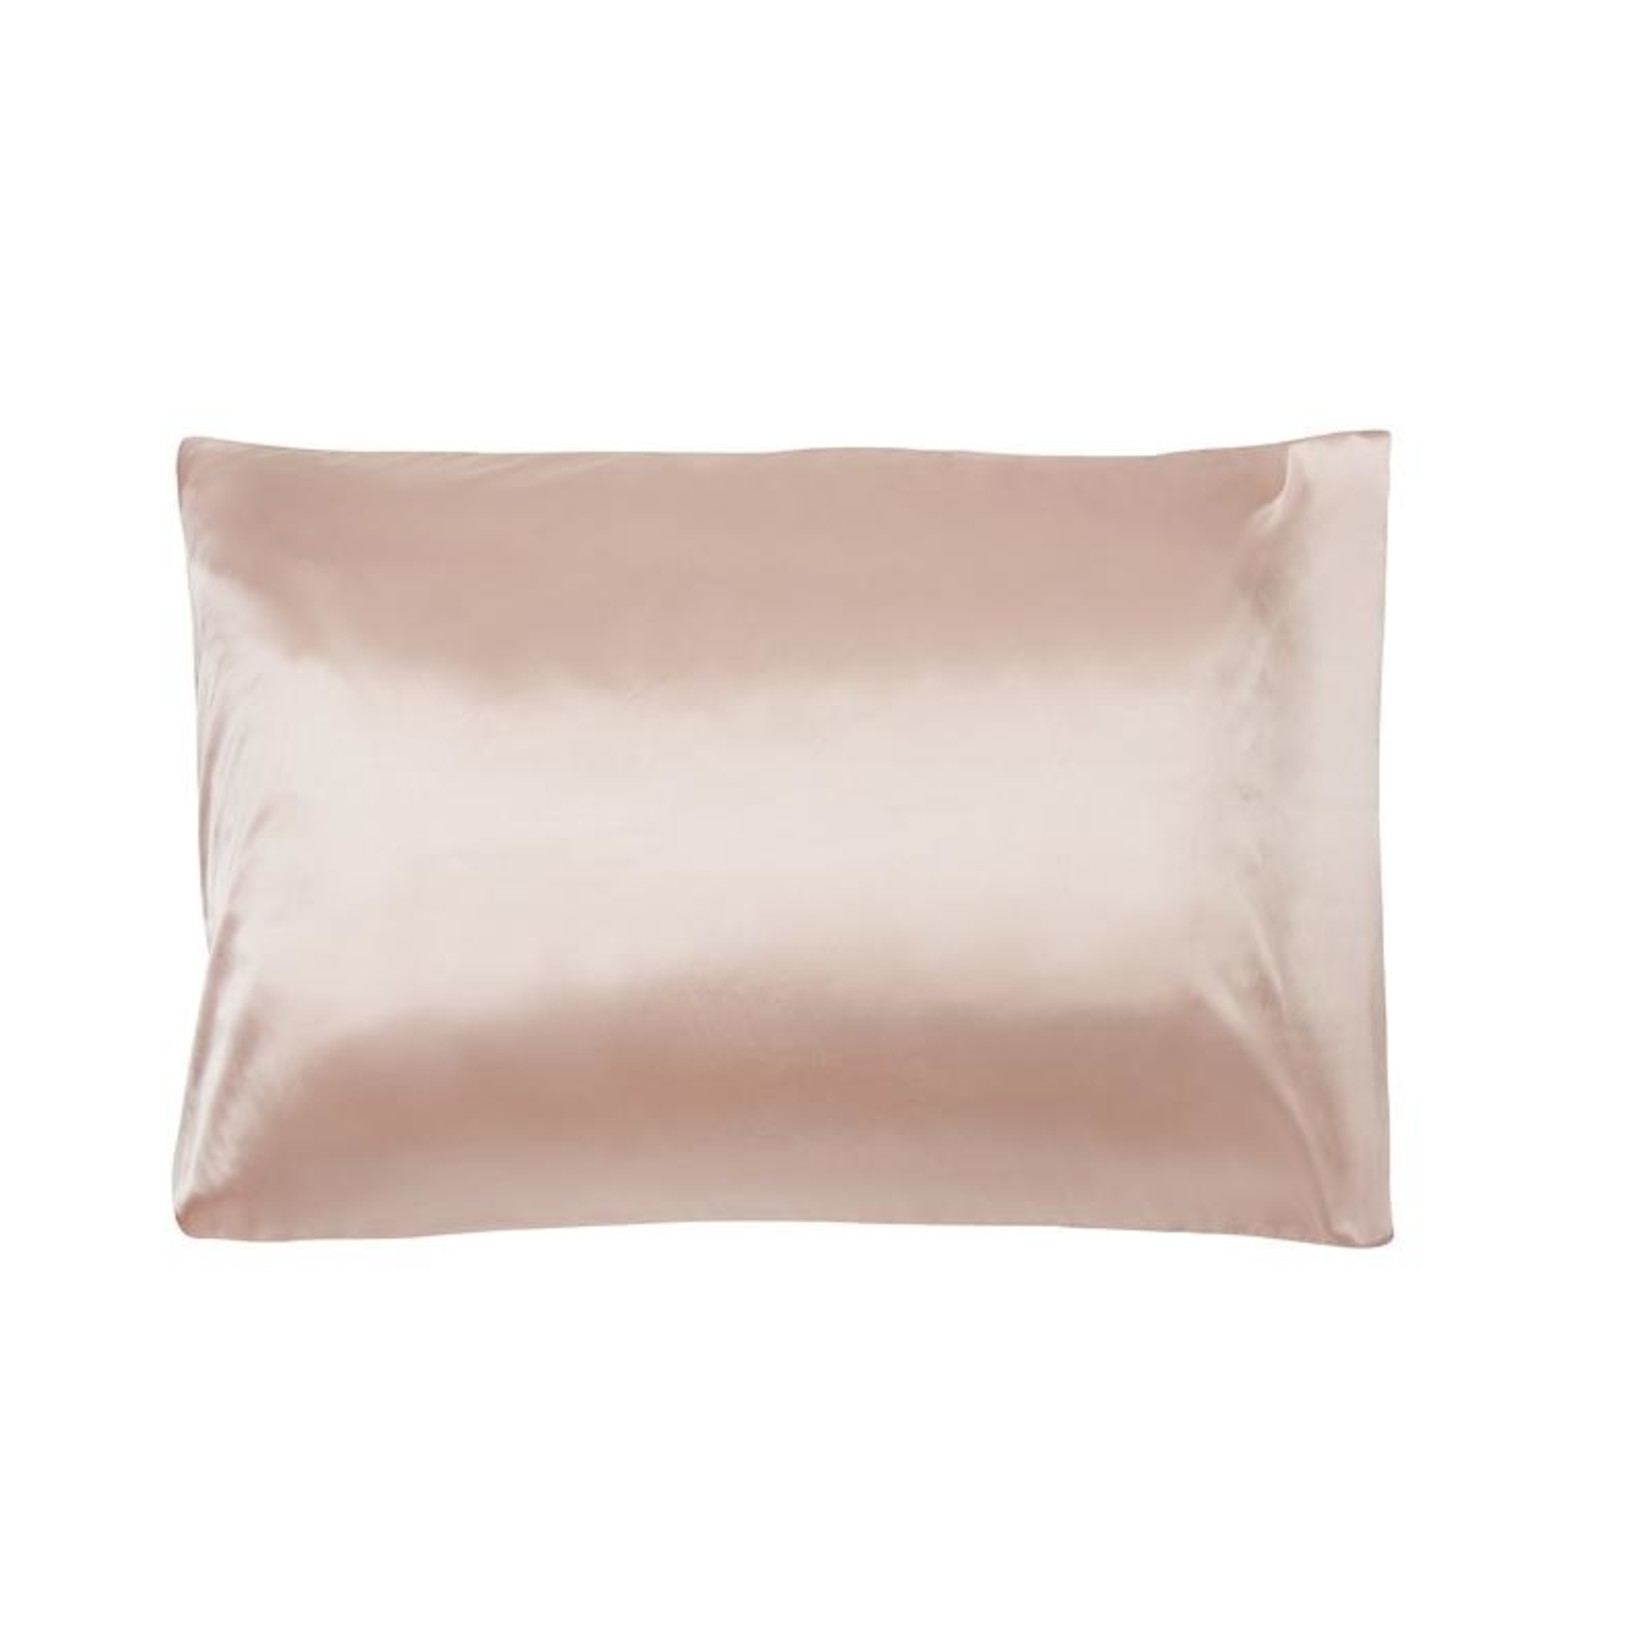 Cloth In A Box LUV IT Dual-Purpose Pillowcase